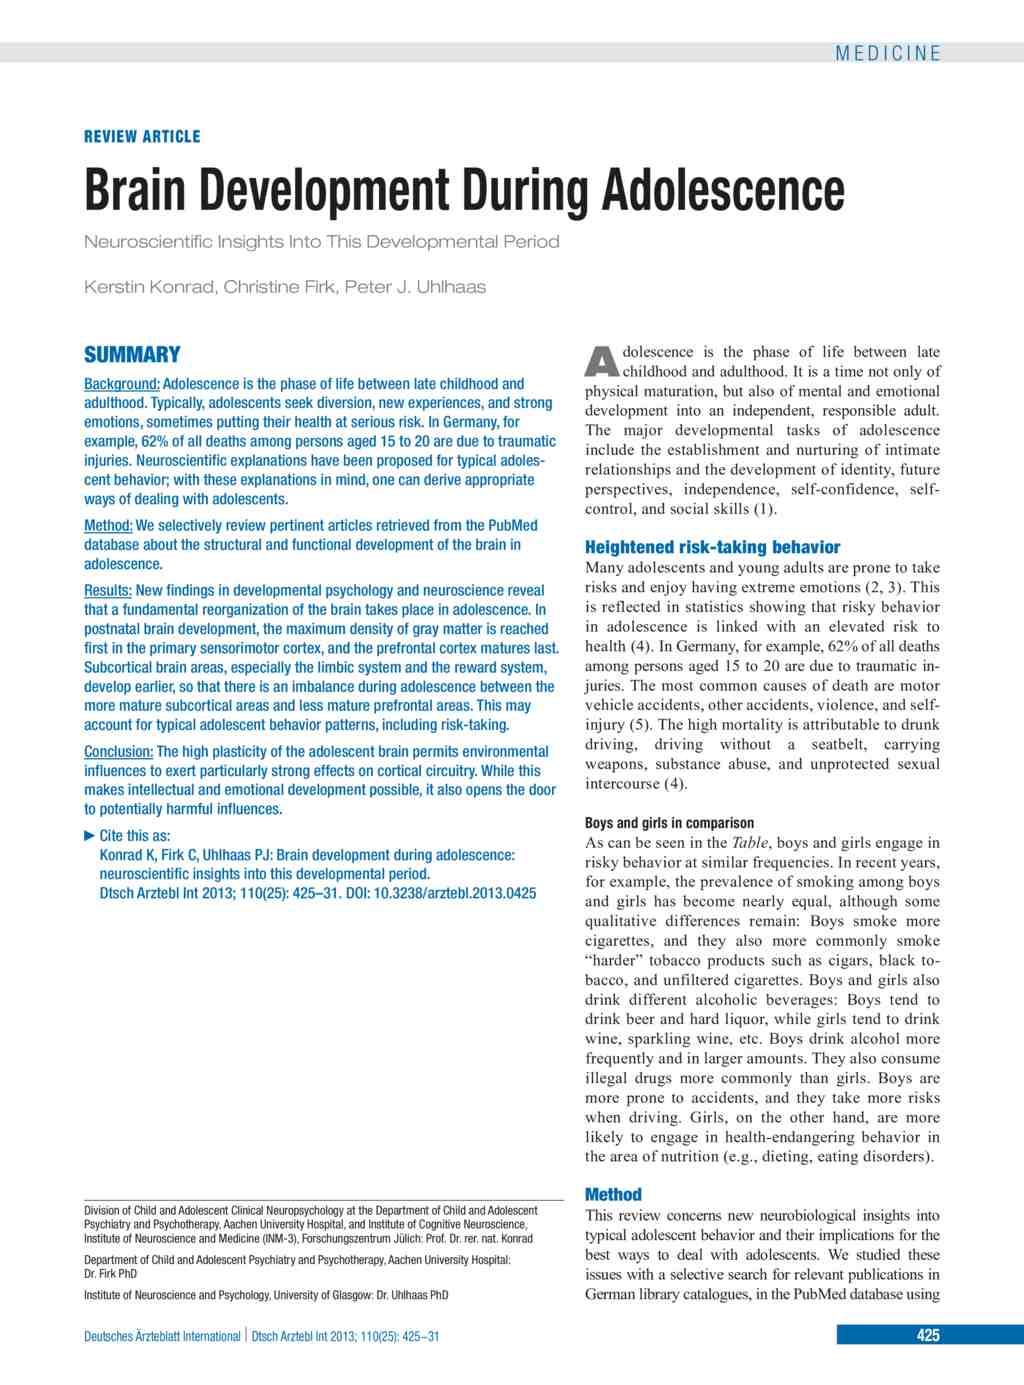 Brain Development During Adolescence (21 06 2013)